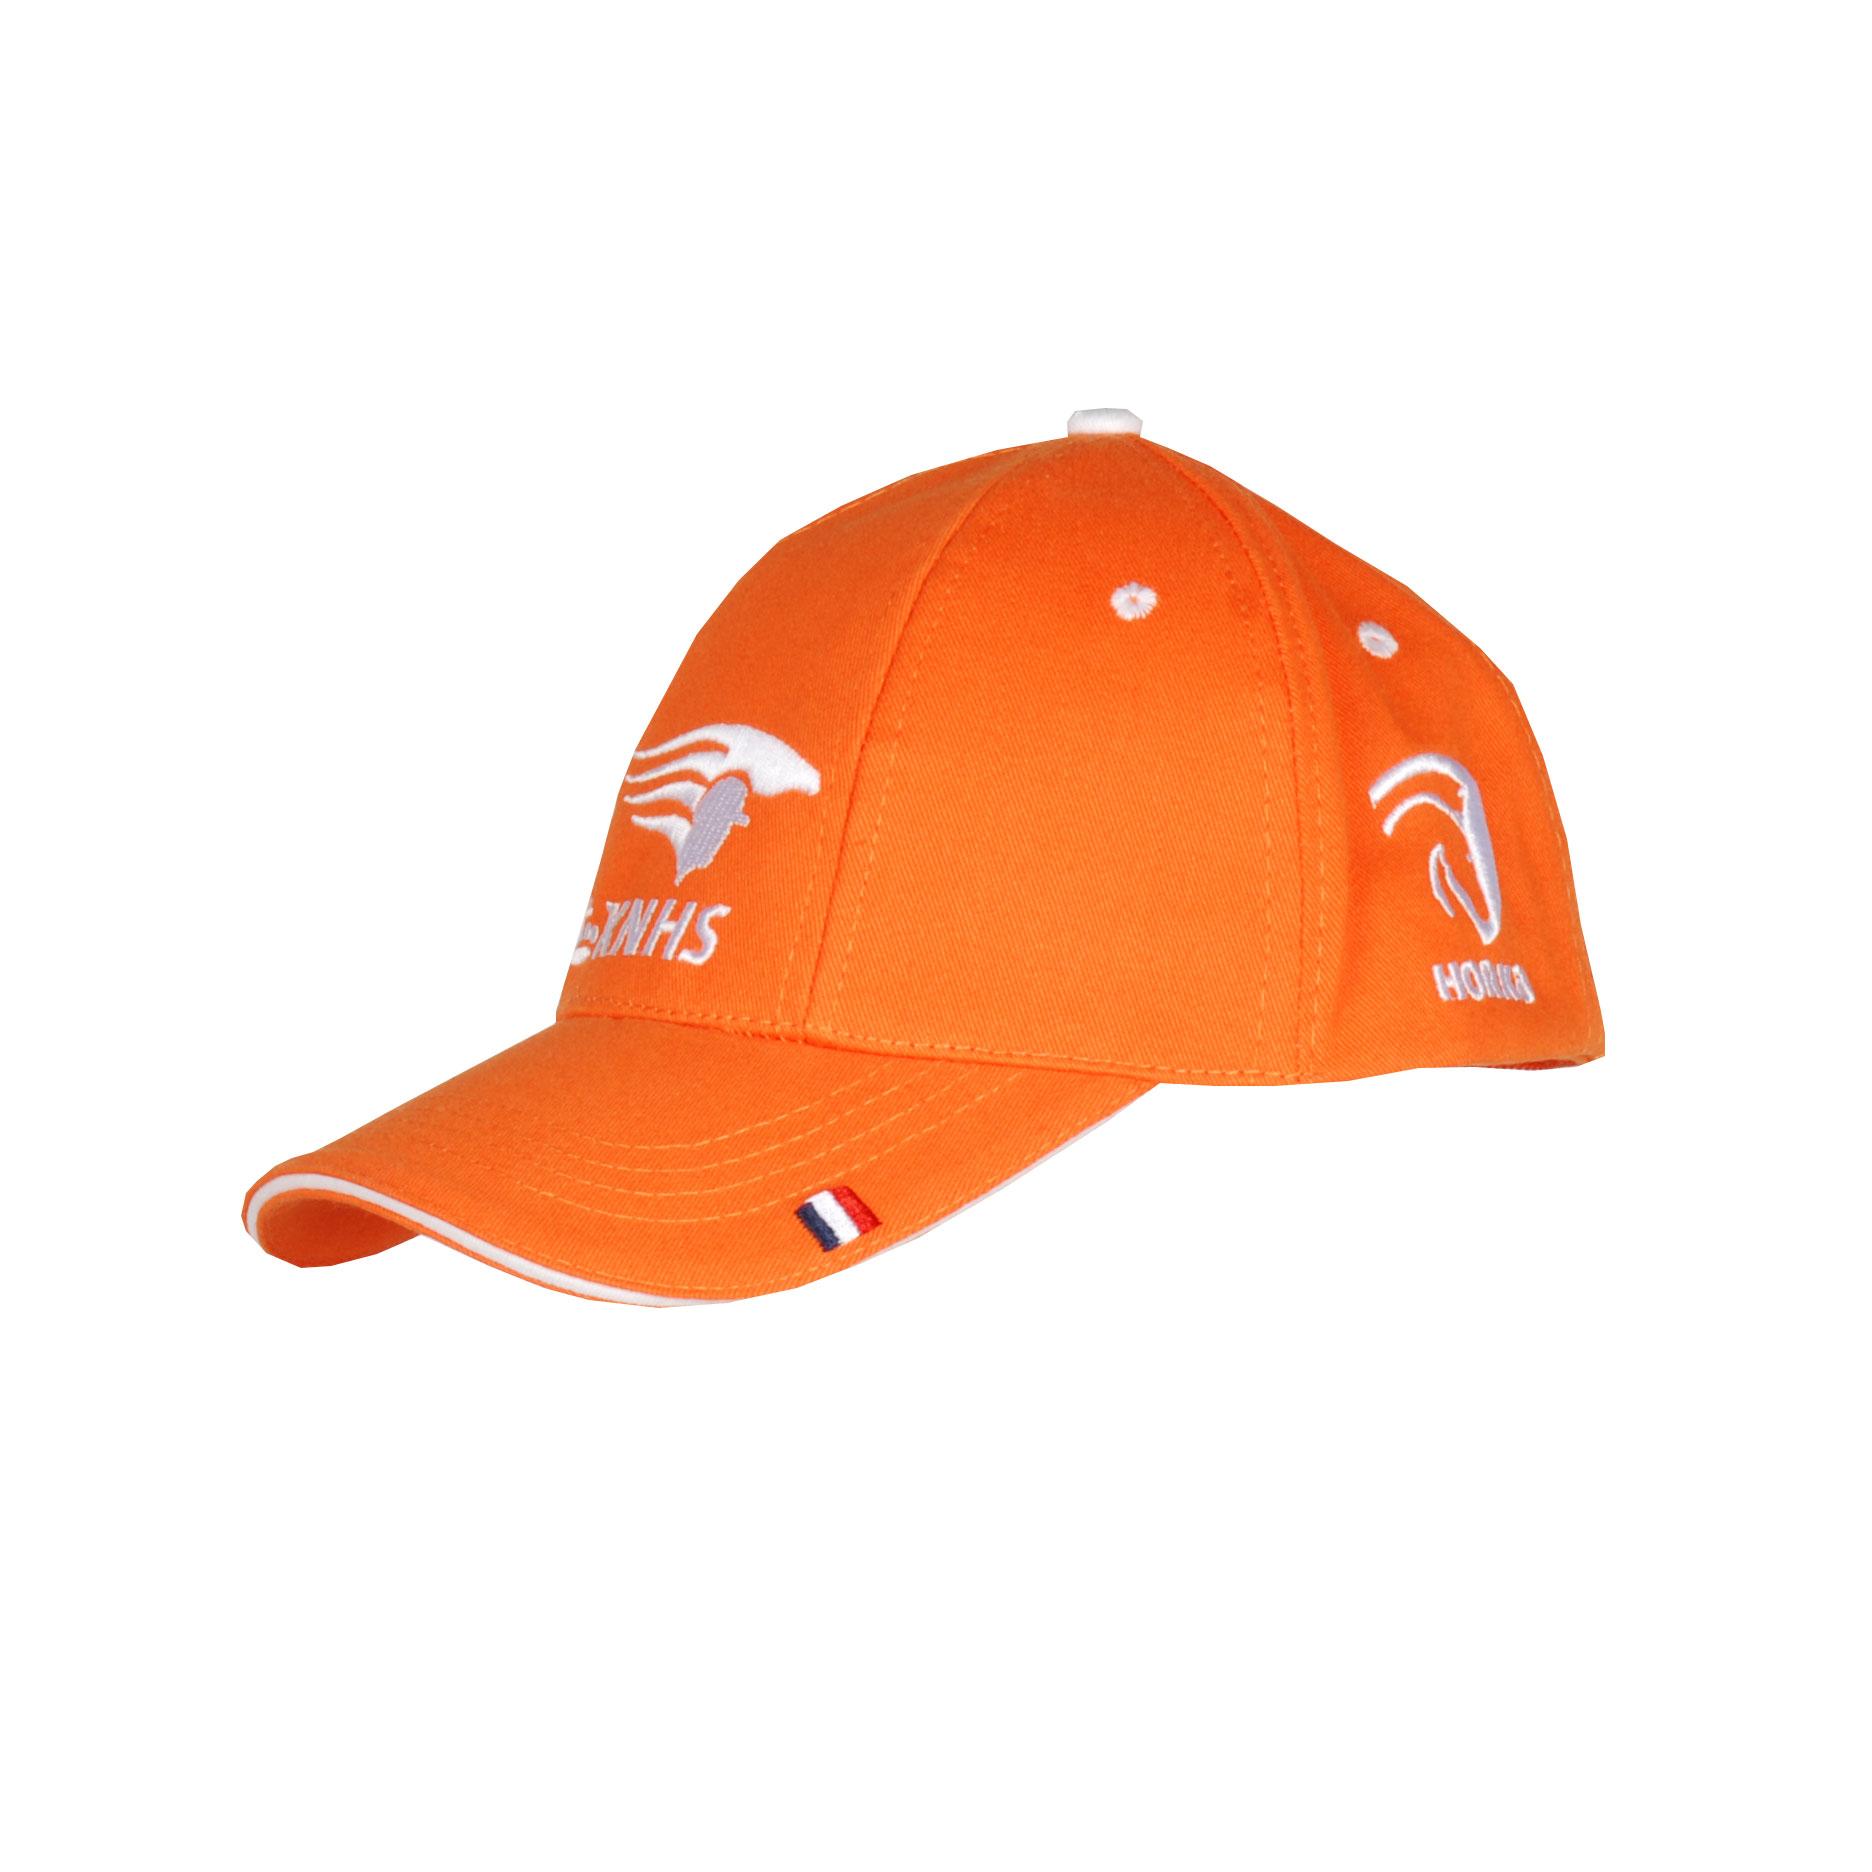 KNHS Fan cap oranje maat:l